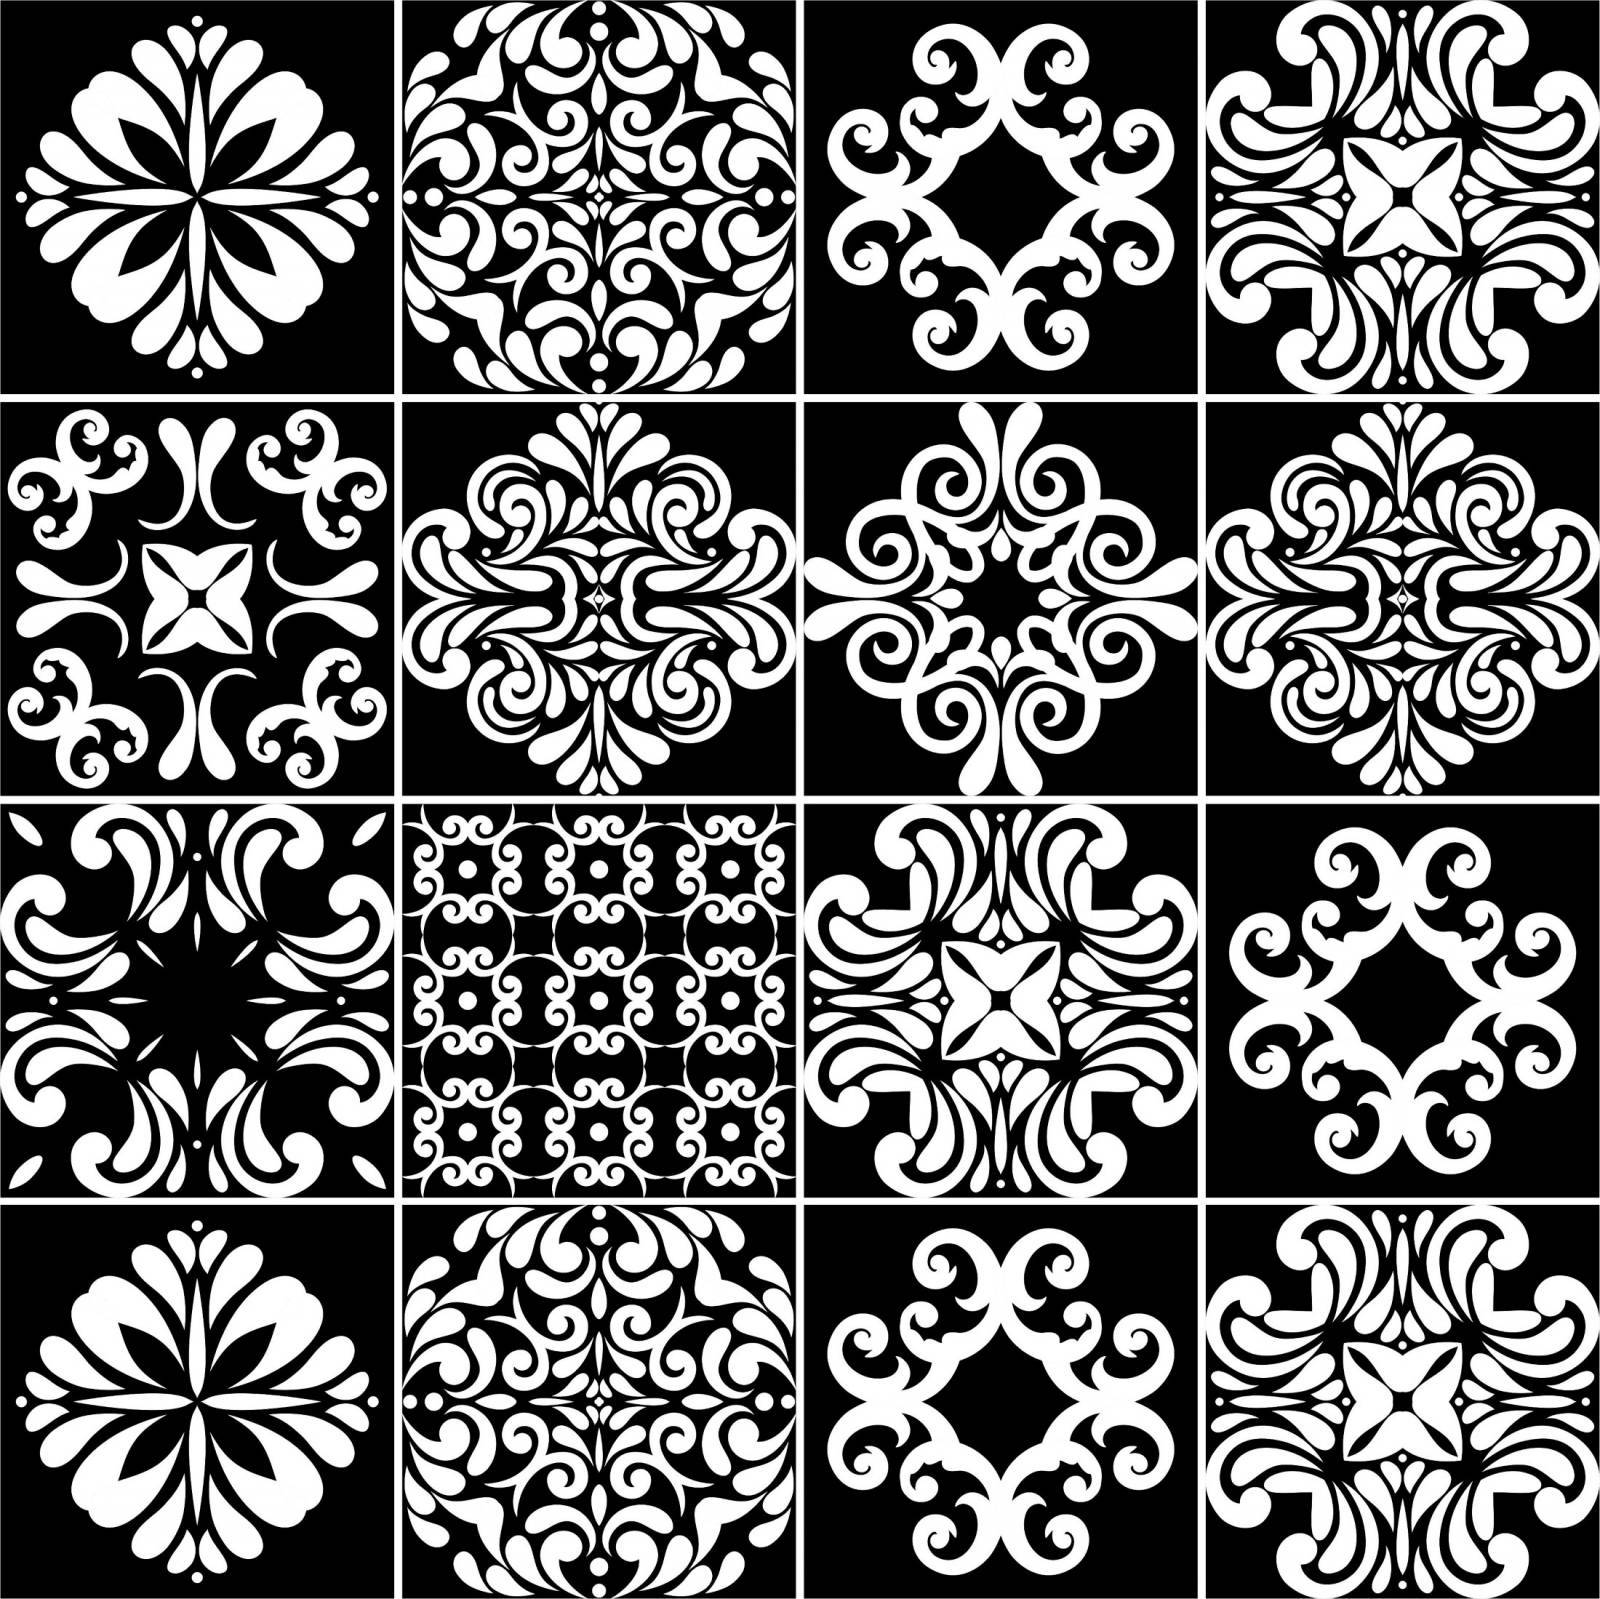 Adesivo para Azulejo - P&B1 imagem 1